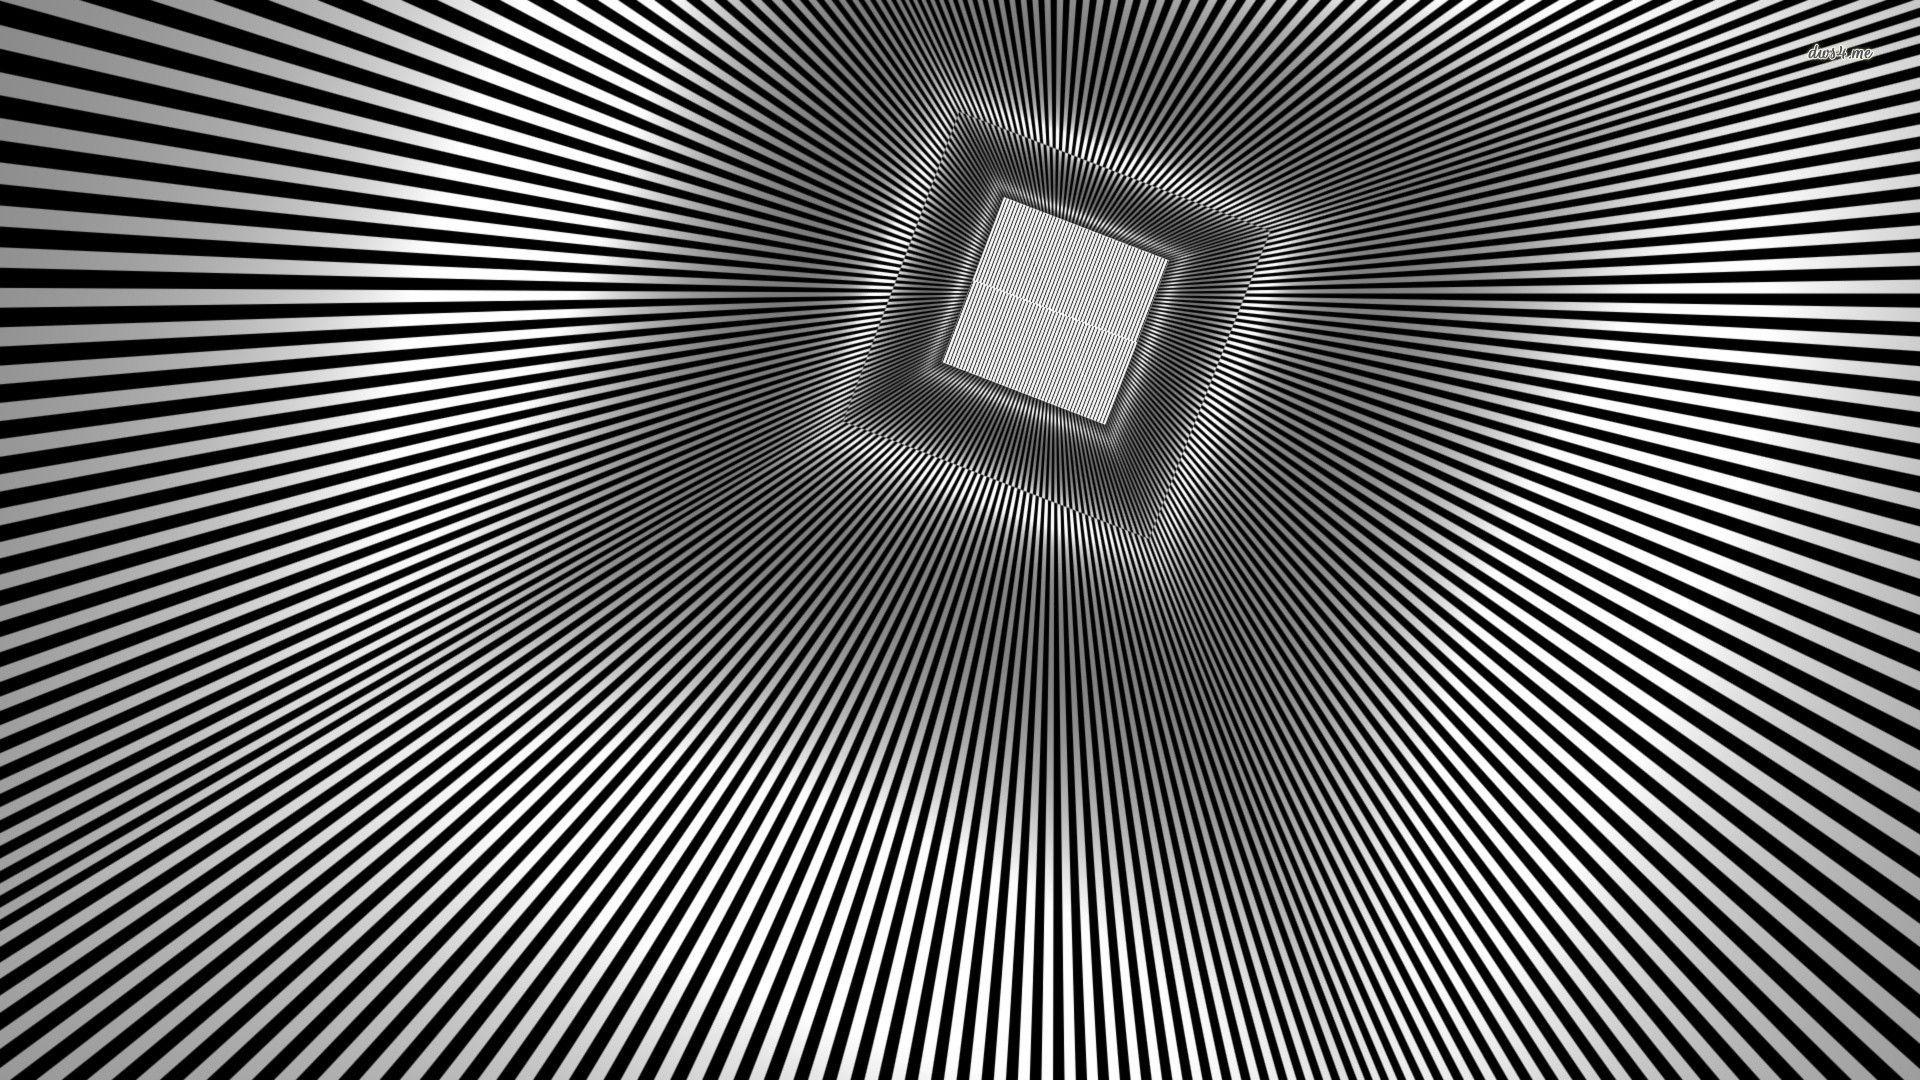 3D Optical Illusions 18493opticalillusion1920x10803d